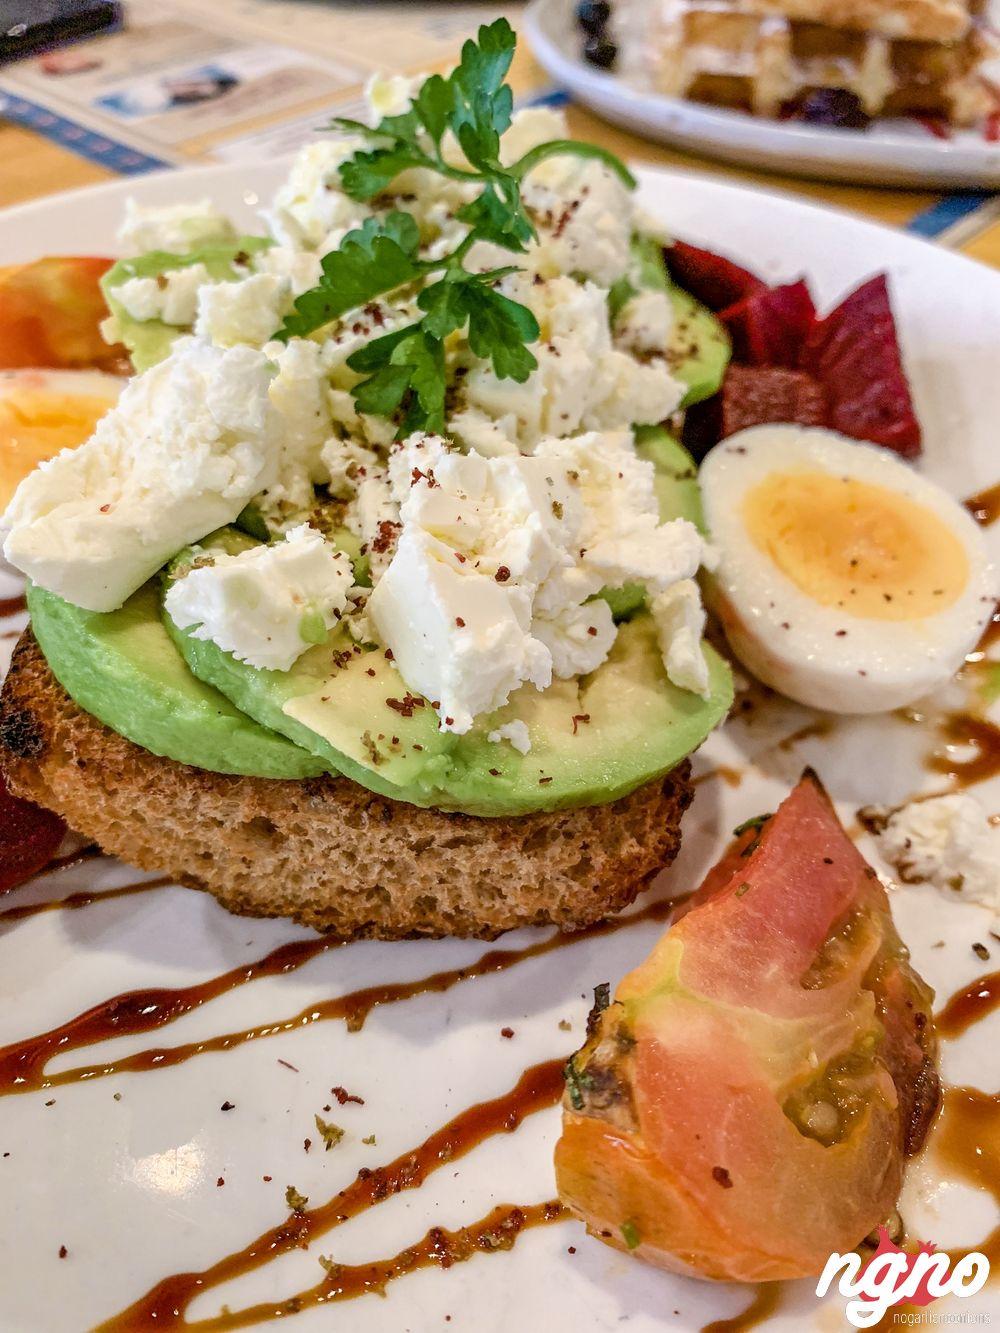 social-house-dubaimall-restaurant-dubai-food-nogarlicnoonions-232018-11-24-07-15-31